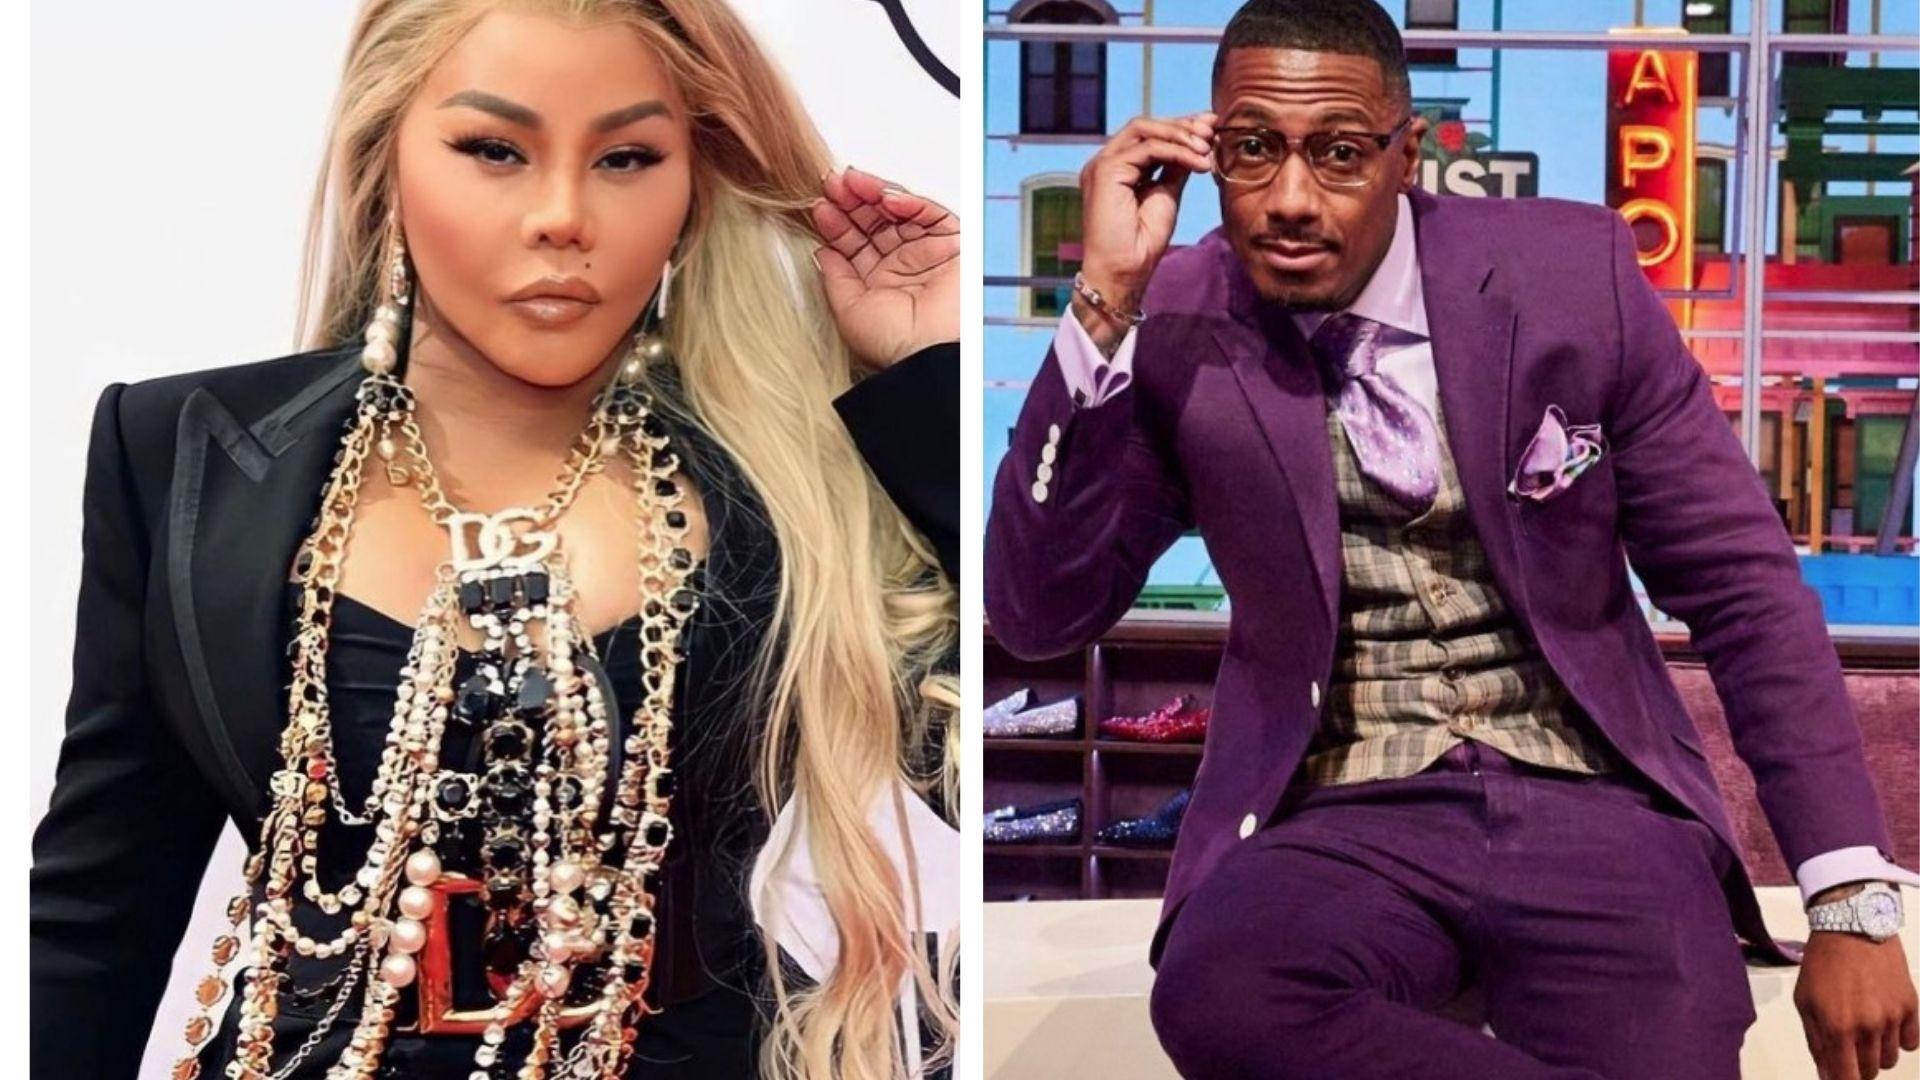 Lil' Kim Reveals that Multitalented Entrepreneur Nick Cannon is Managing Her Career